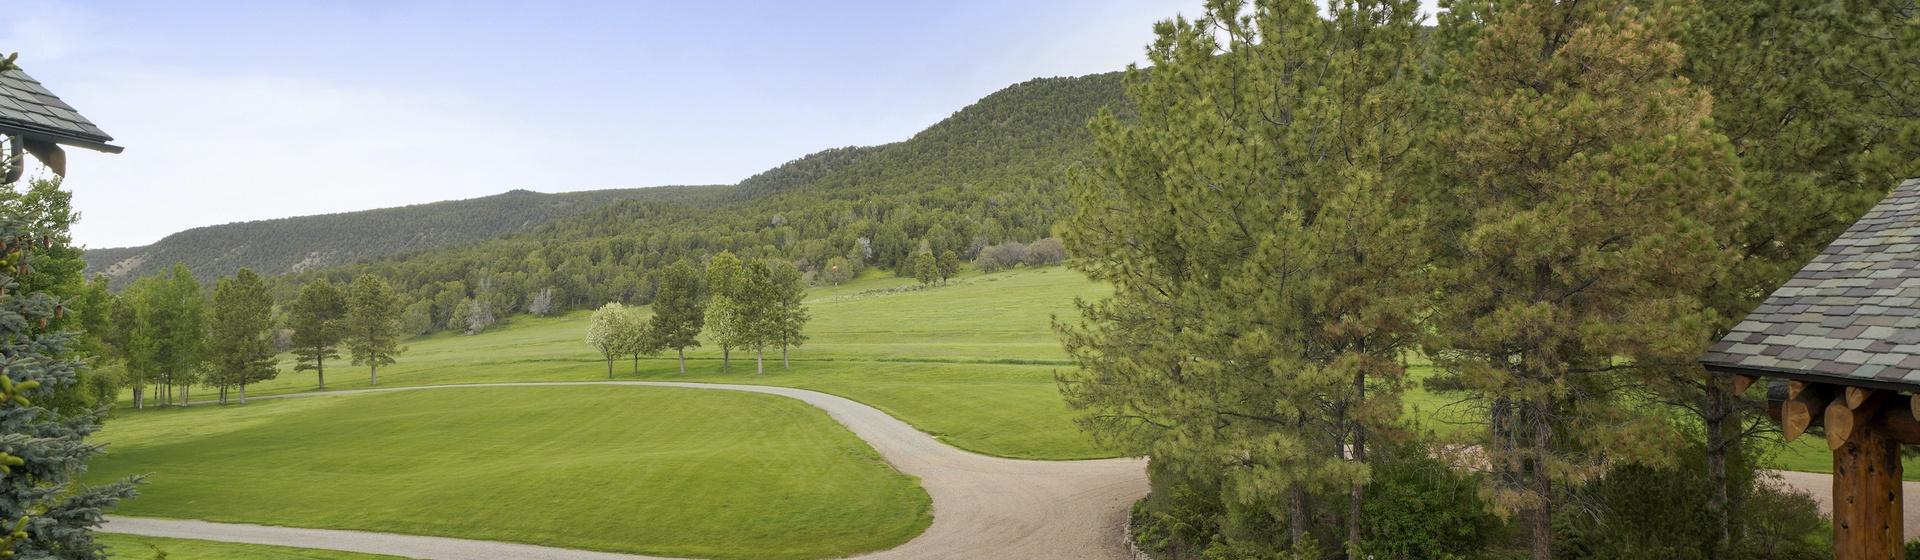 13.8-Telluride-Sleeping-Indian-Ranch-view-2-web.JPG